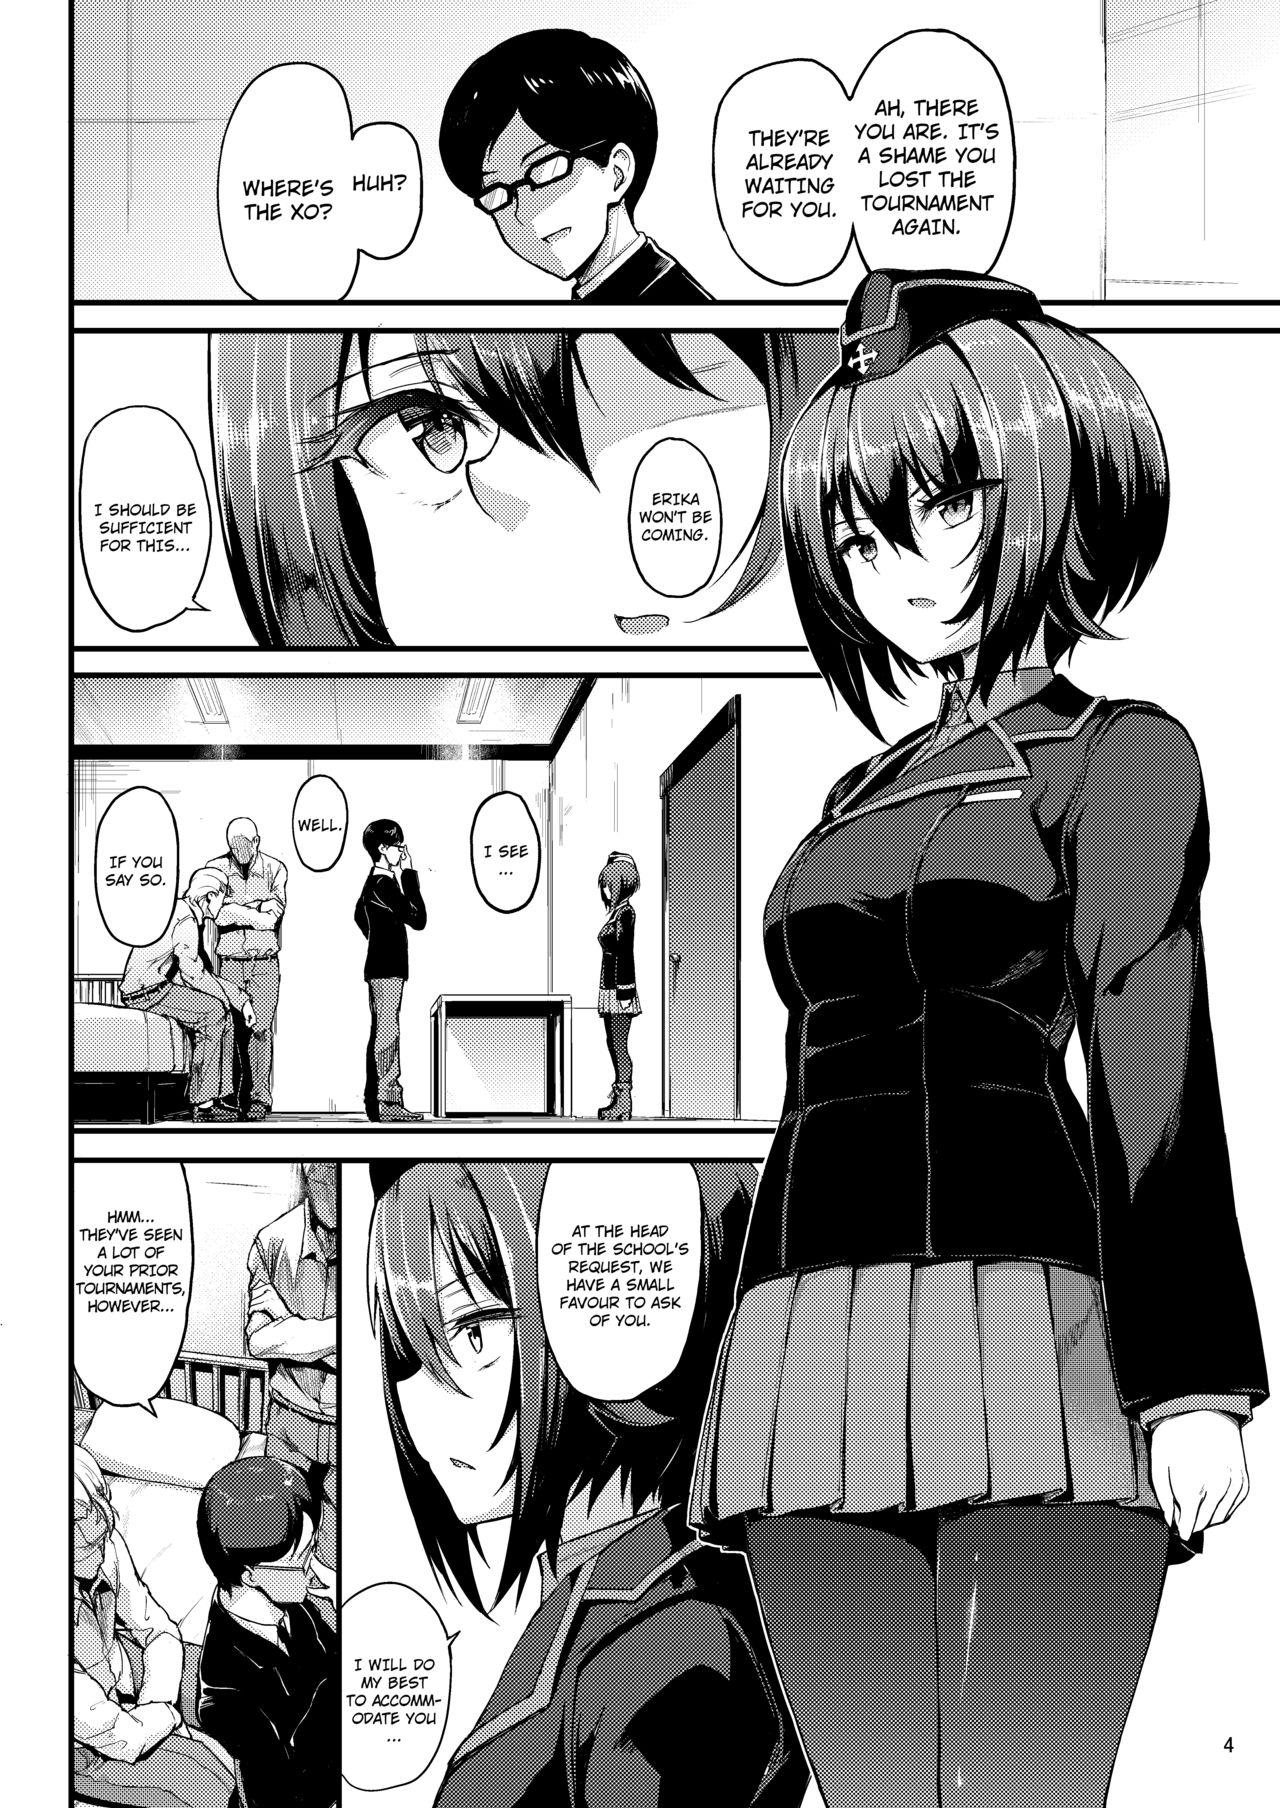 (C93) [Kyockchokyock (Kyockcho)] Kuromorimine Ryoujoku -Zenjitsu Shou- | The Rape of Kuromorimine -The First Day- (Girls und Panzer) [English] =7BA= 2